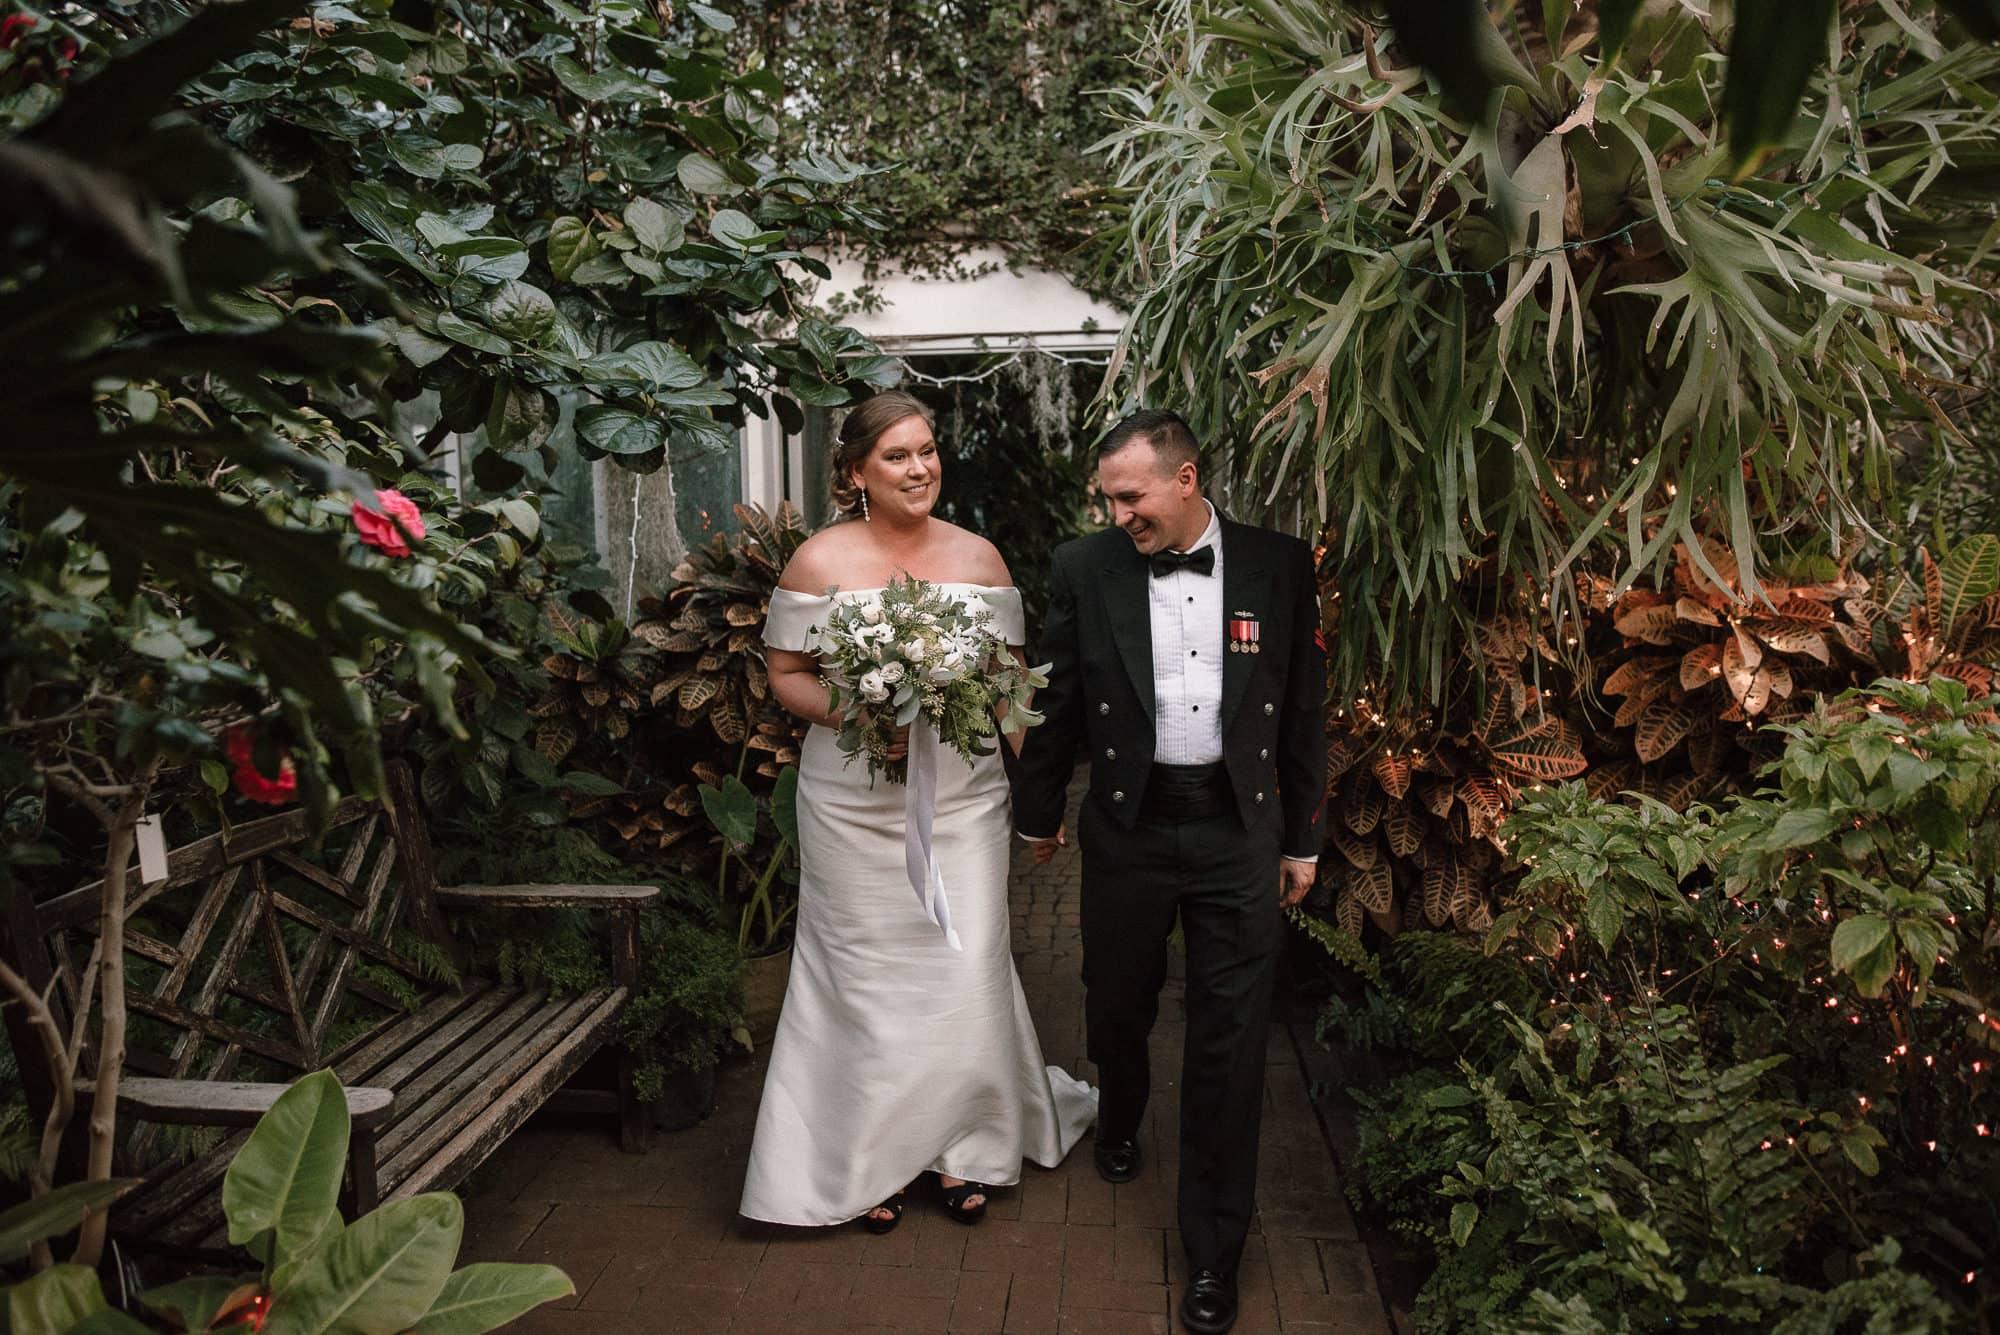 Wedding photo in Lamberton Conservatory, Photo by Matt Lim